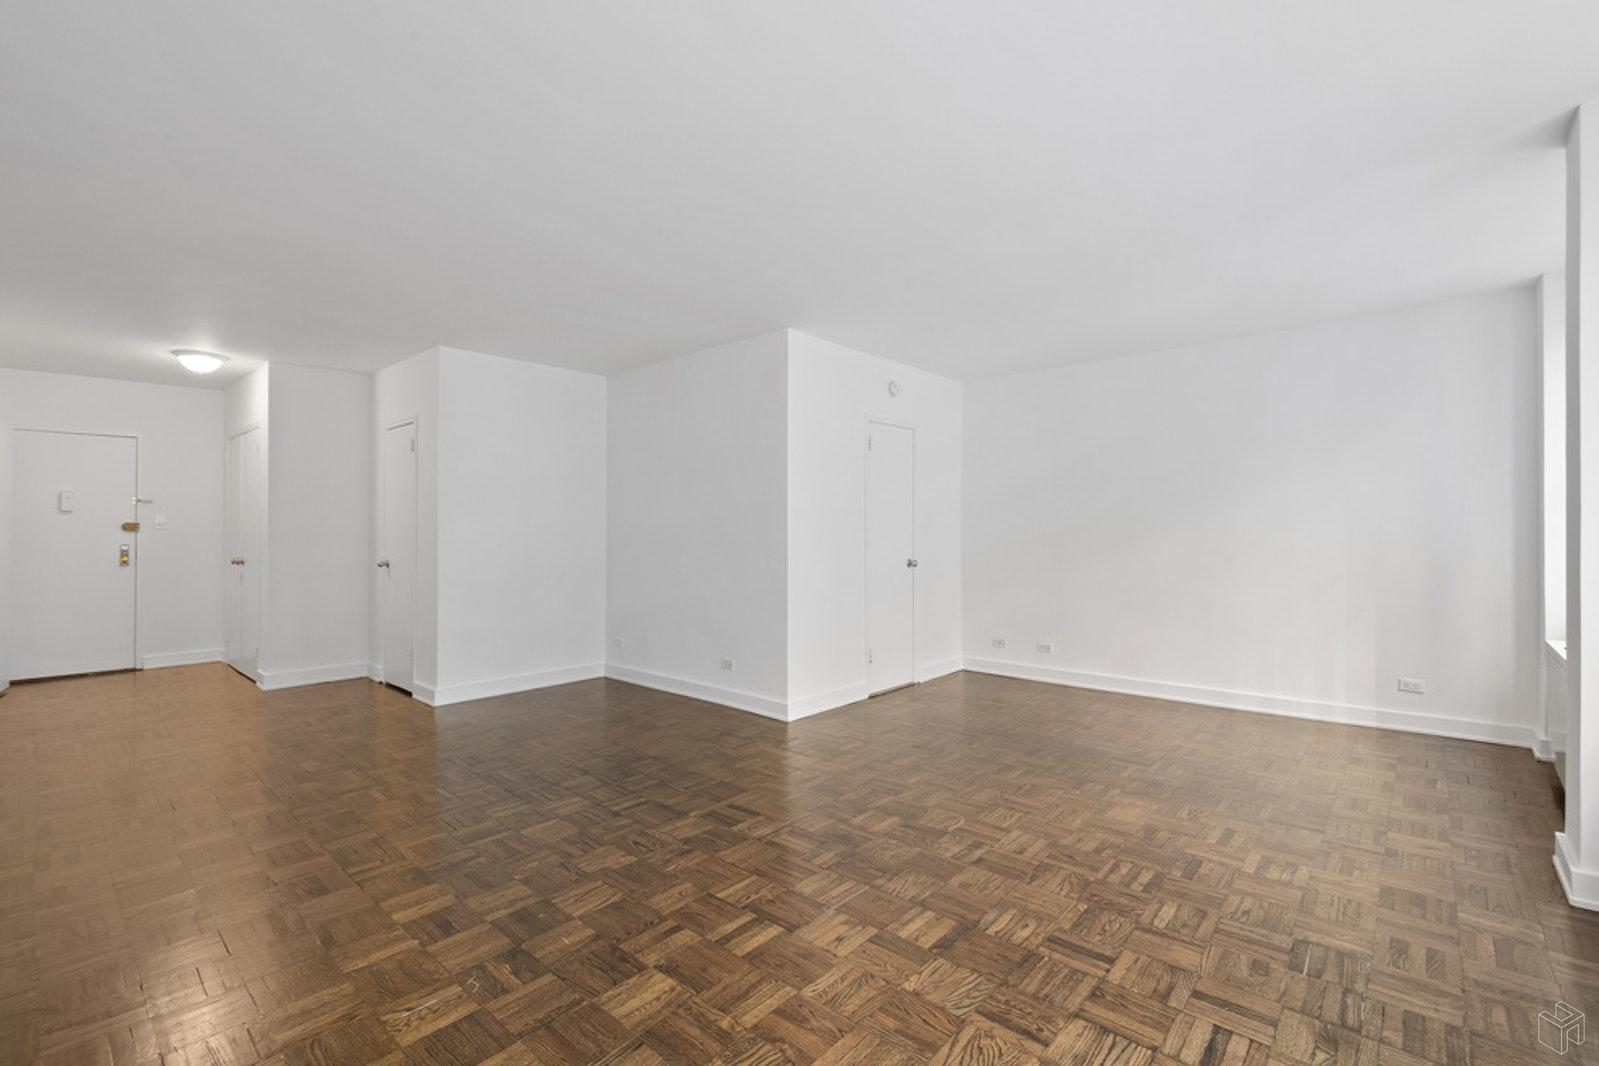 155 EAST 55TH STREET 10B, Midtown East, $2,950, Web #: 19492589